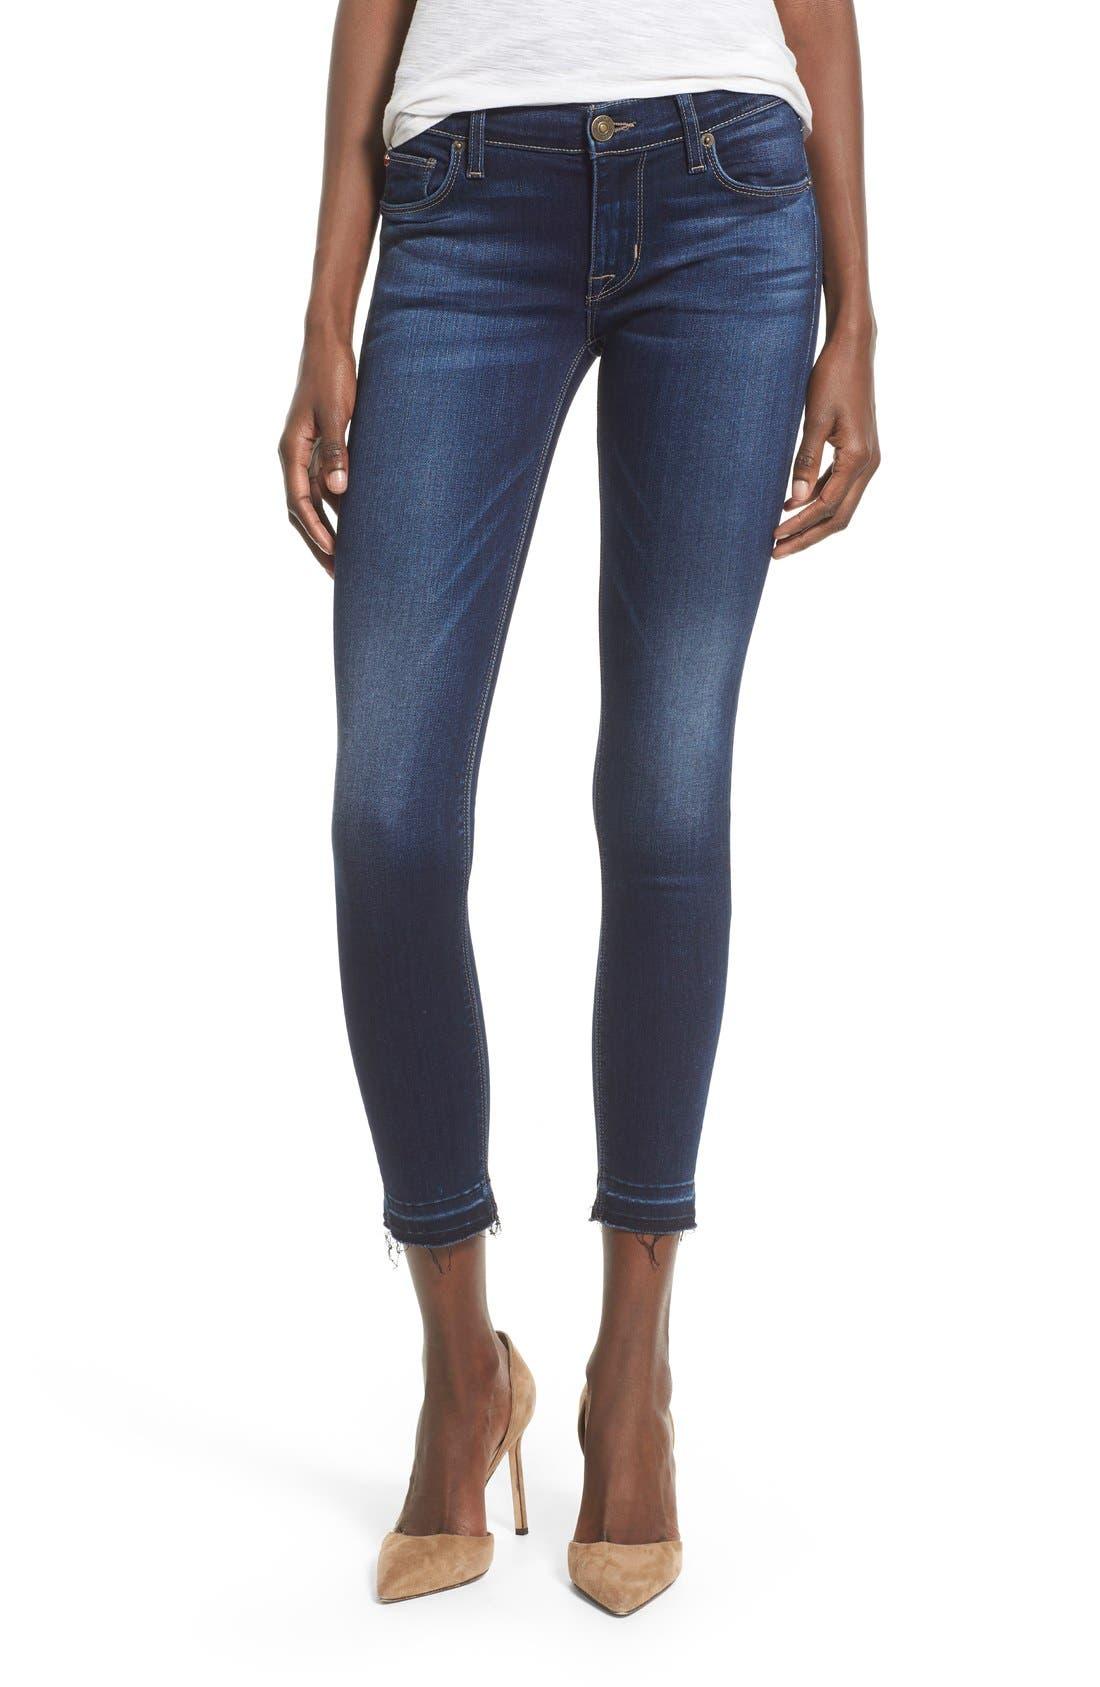 Main Image - Hudson Jeans 'Krista' Release Hem Jeans (Crest Falls)